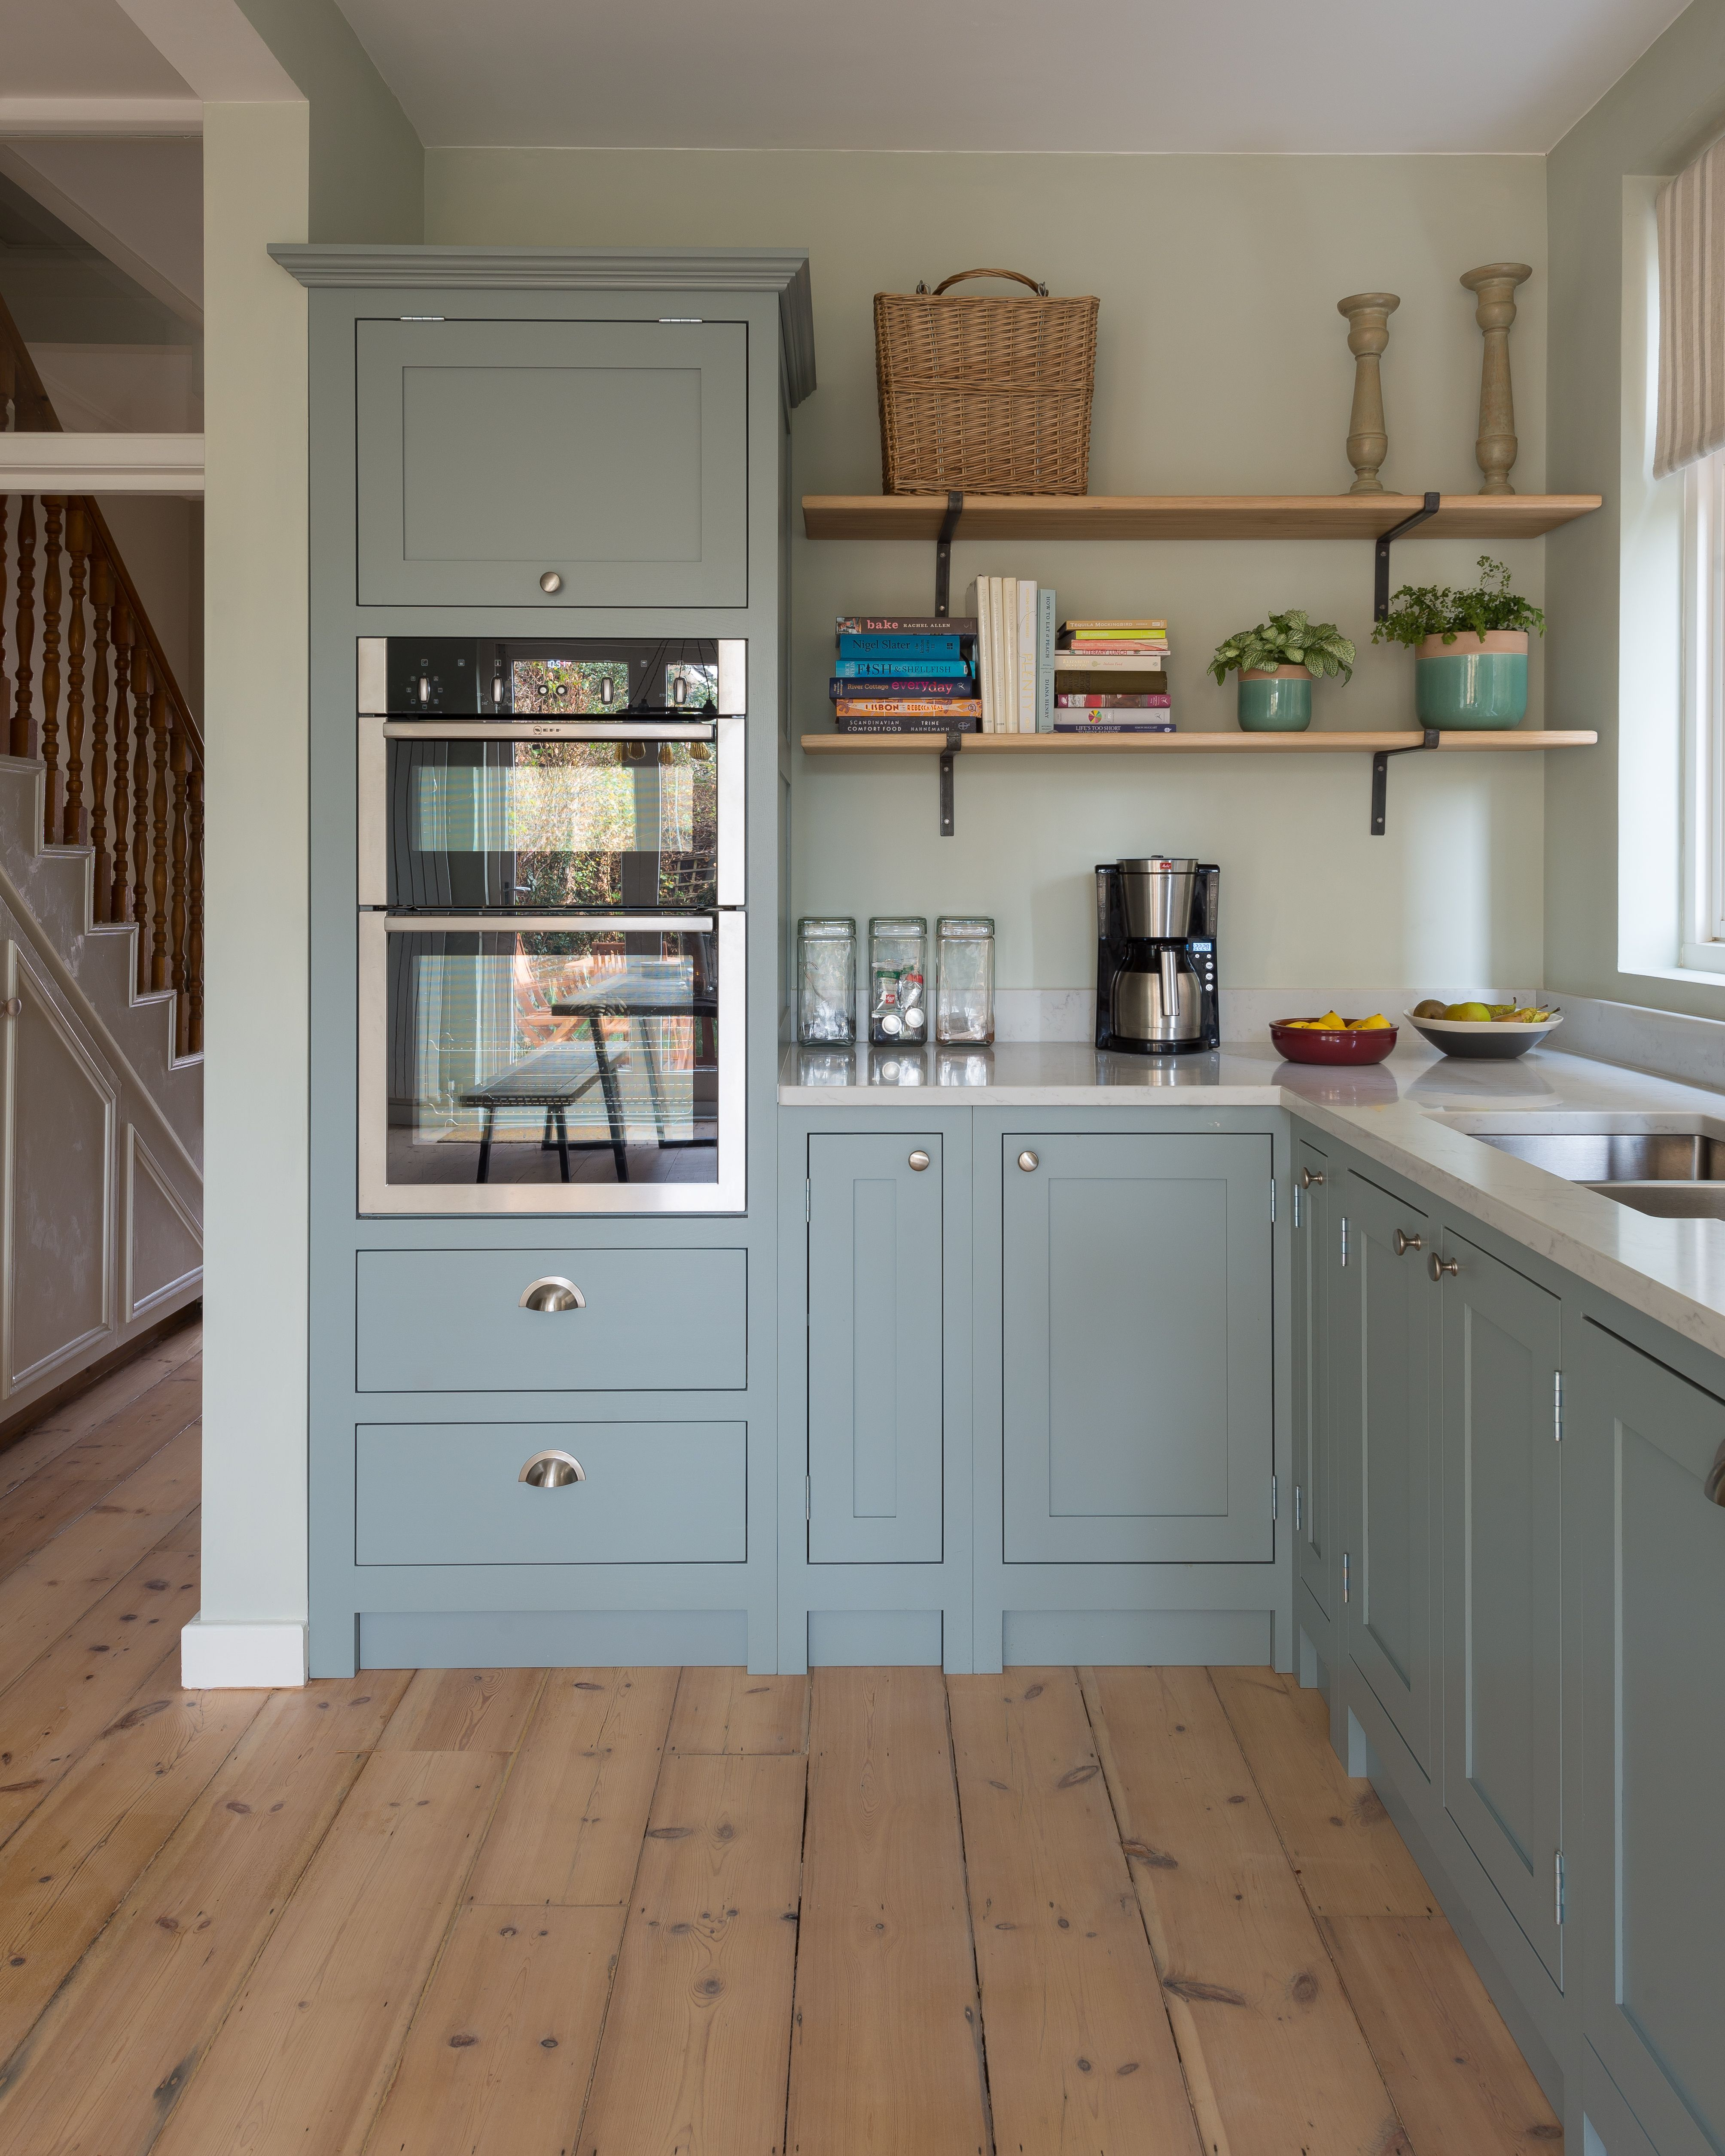 Pale Blue Shaker Kitchen Blue Shaker Kitchen Shaker Kitchen Kitchen Cabinet Trends